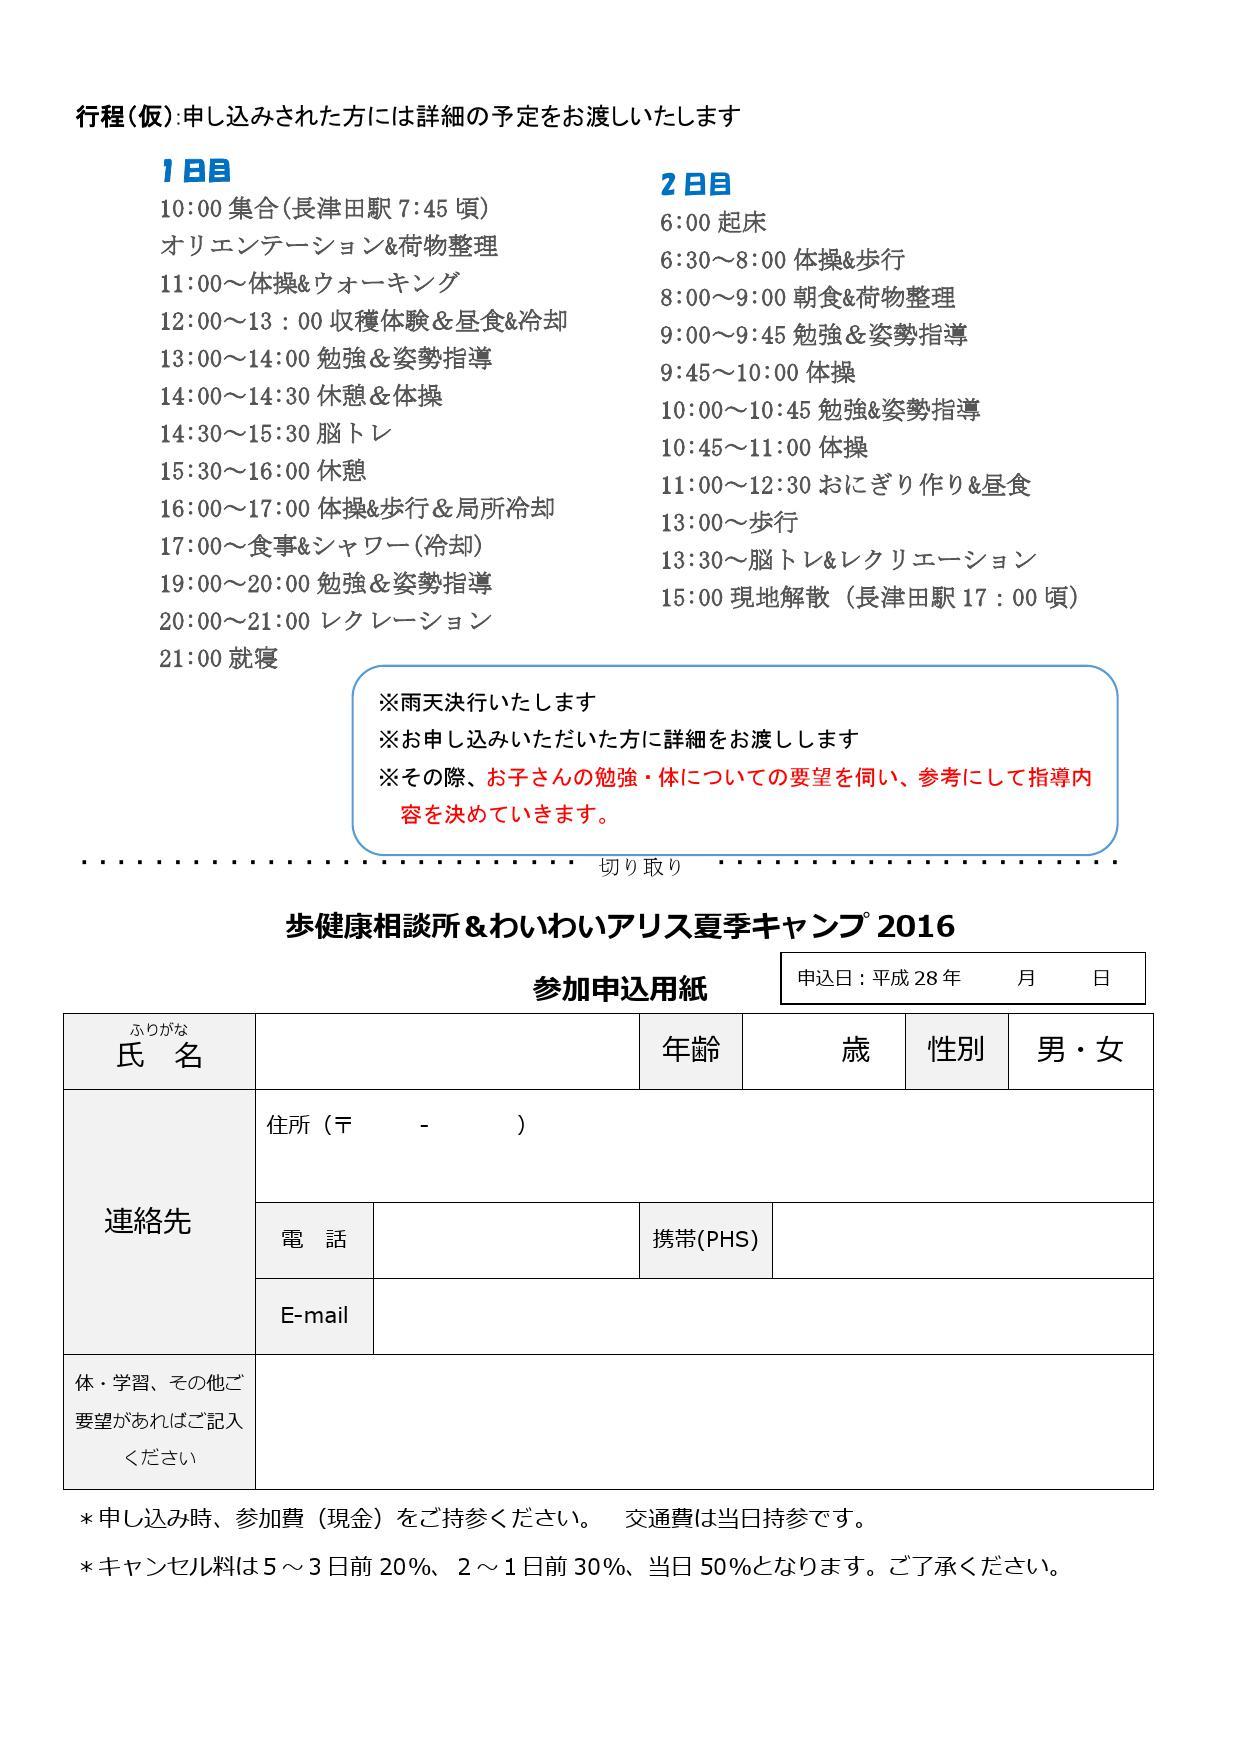 camp2016_000002